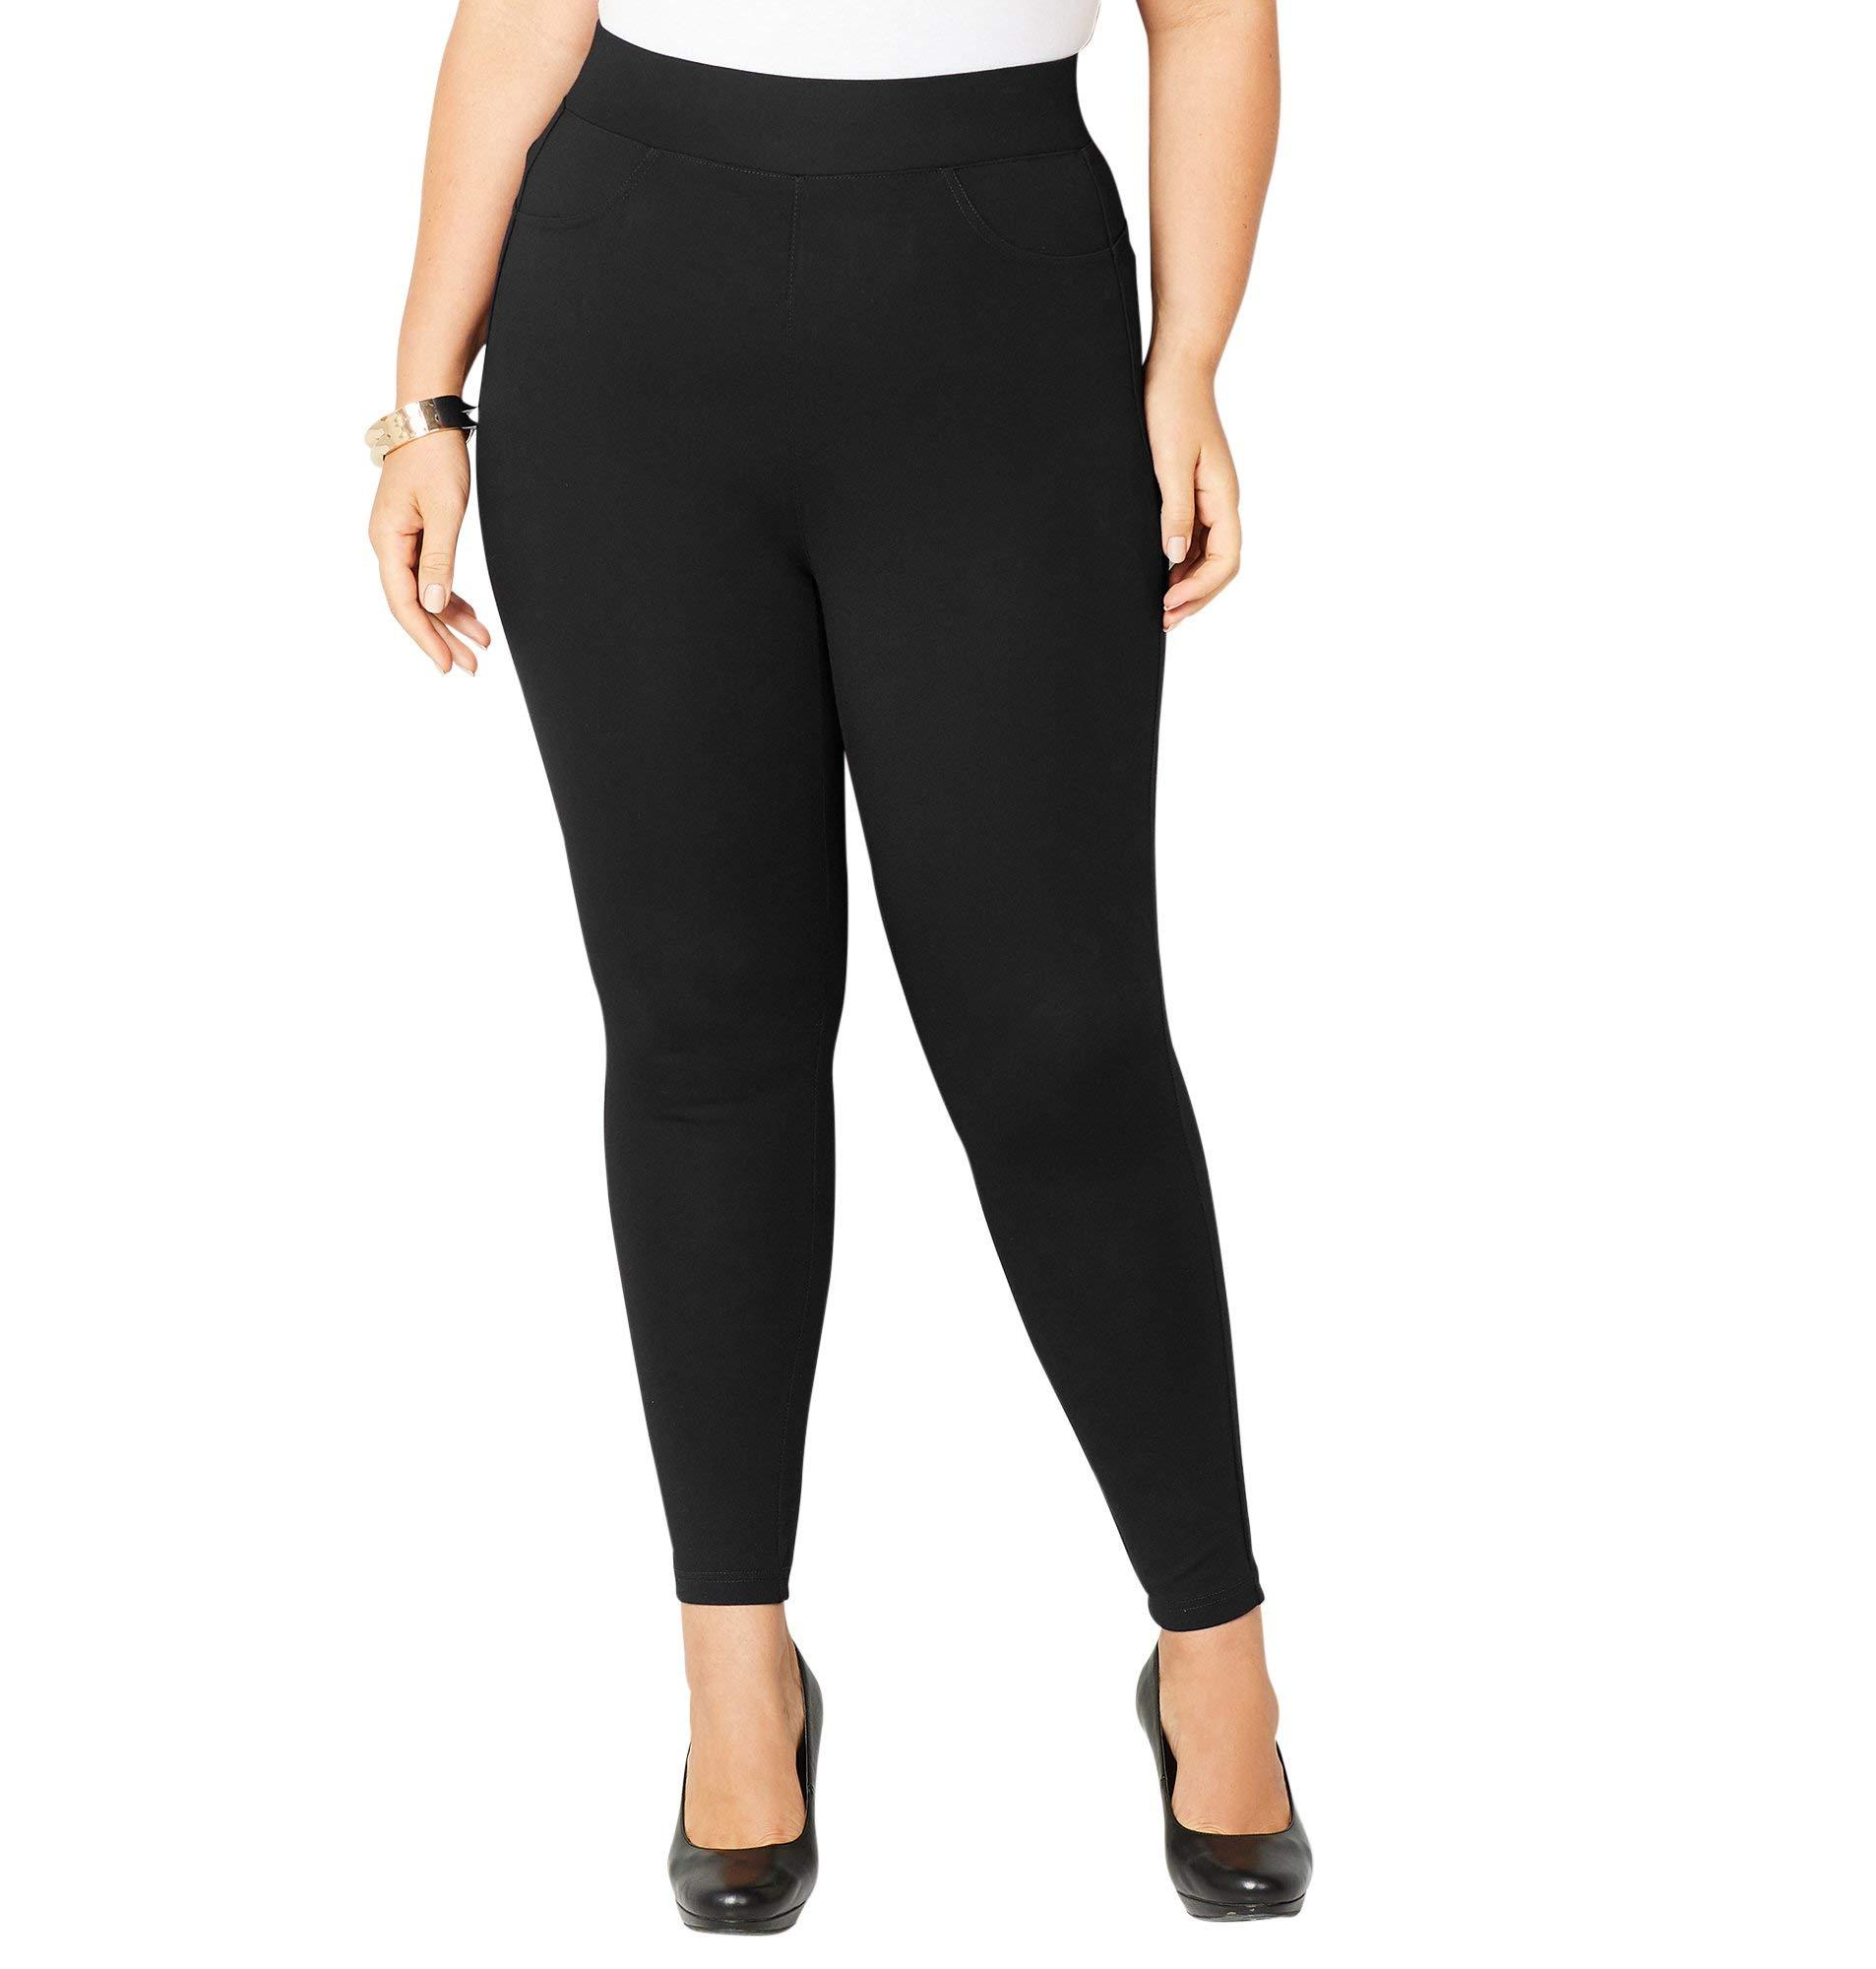 Avenue Women's Wide Waist Ponte Legging, 26/28 Black